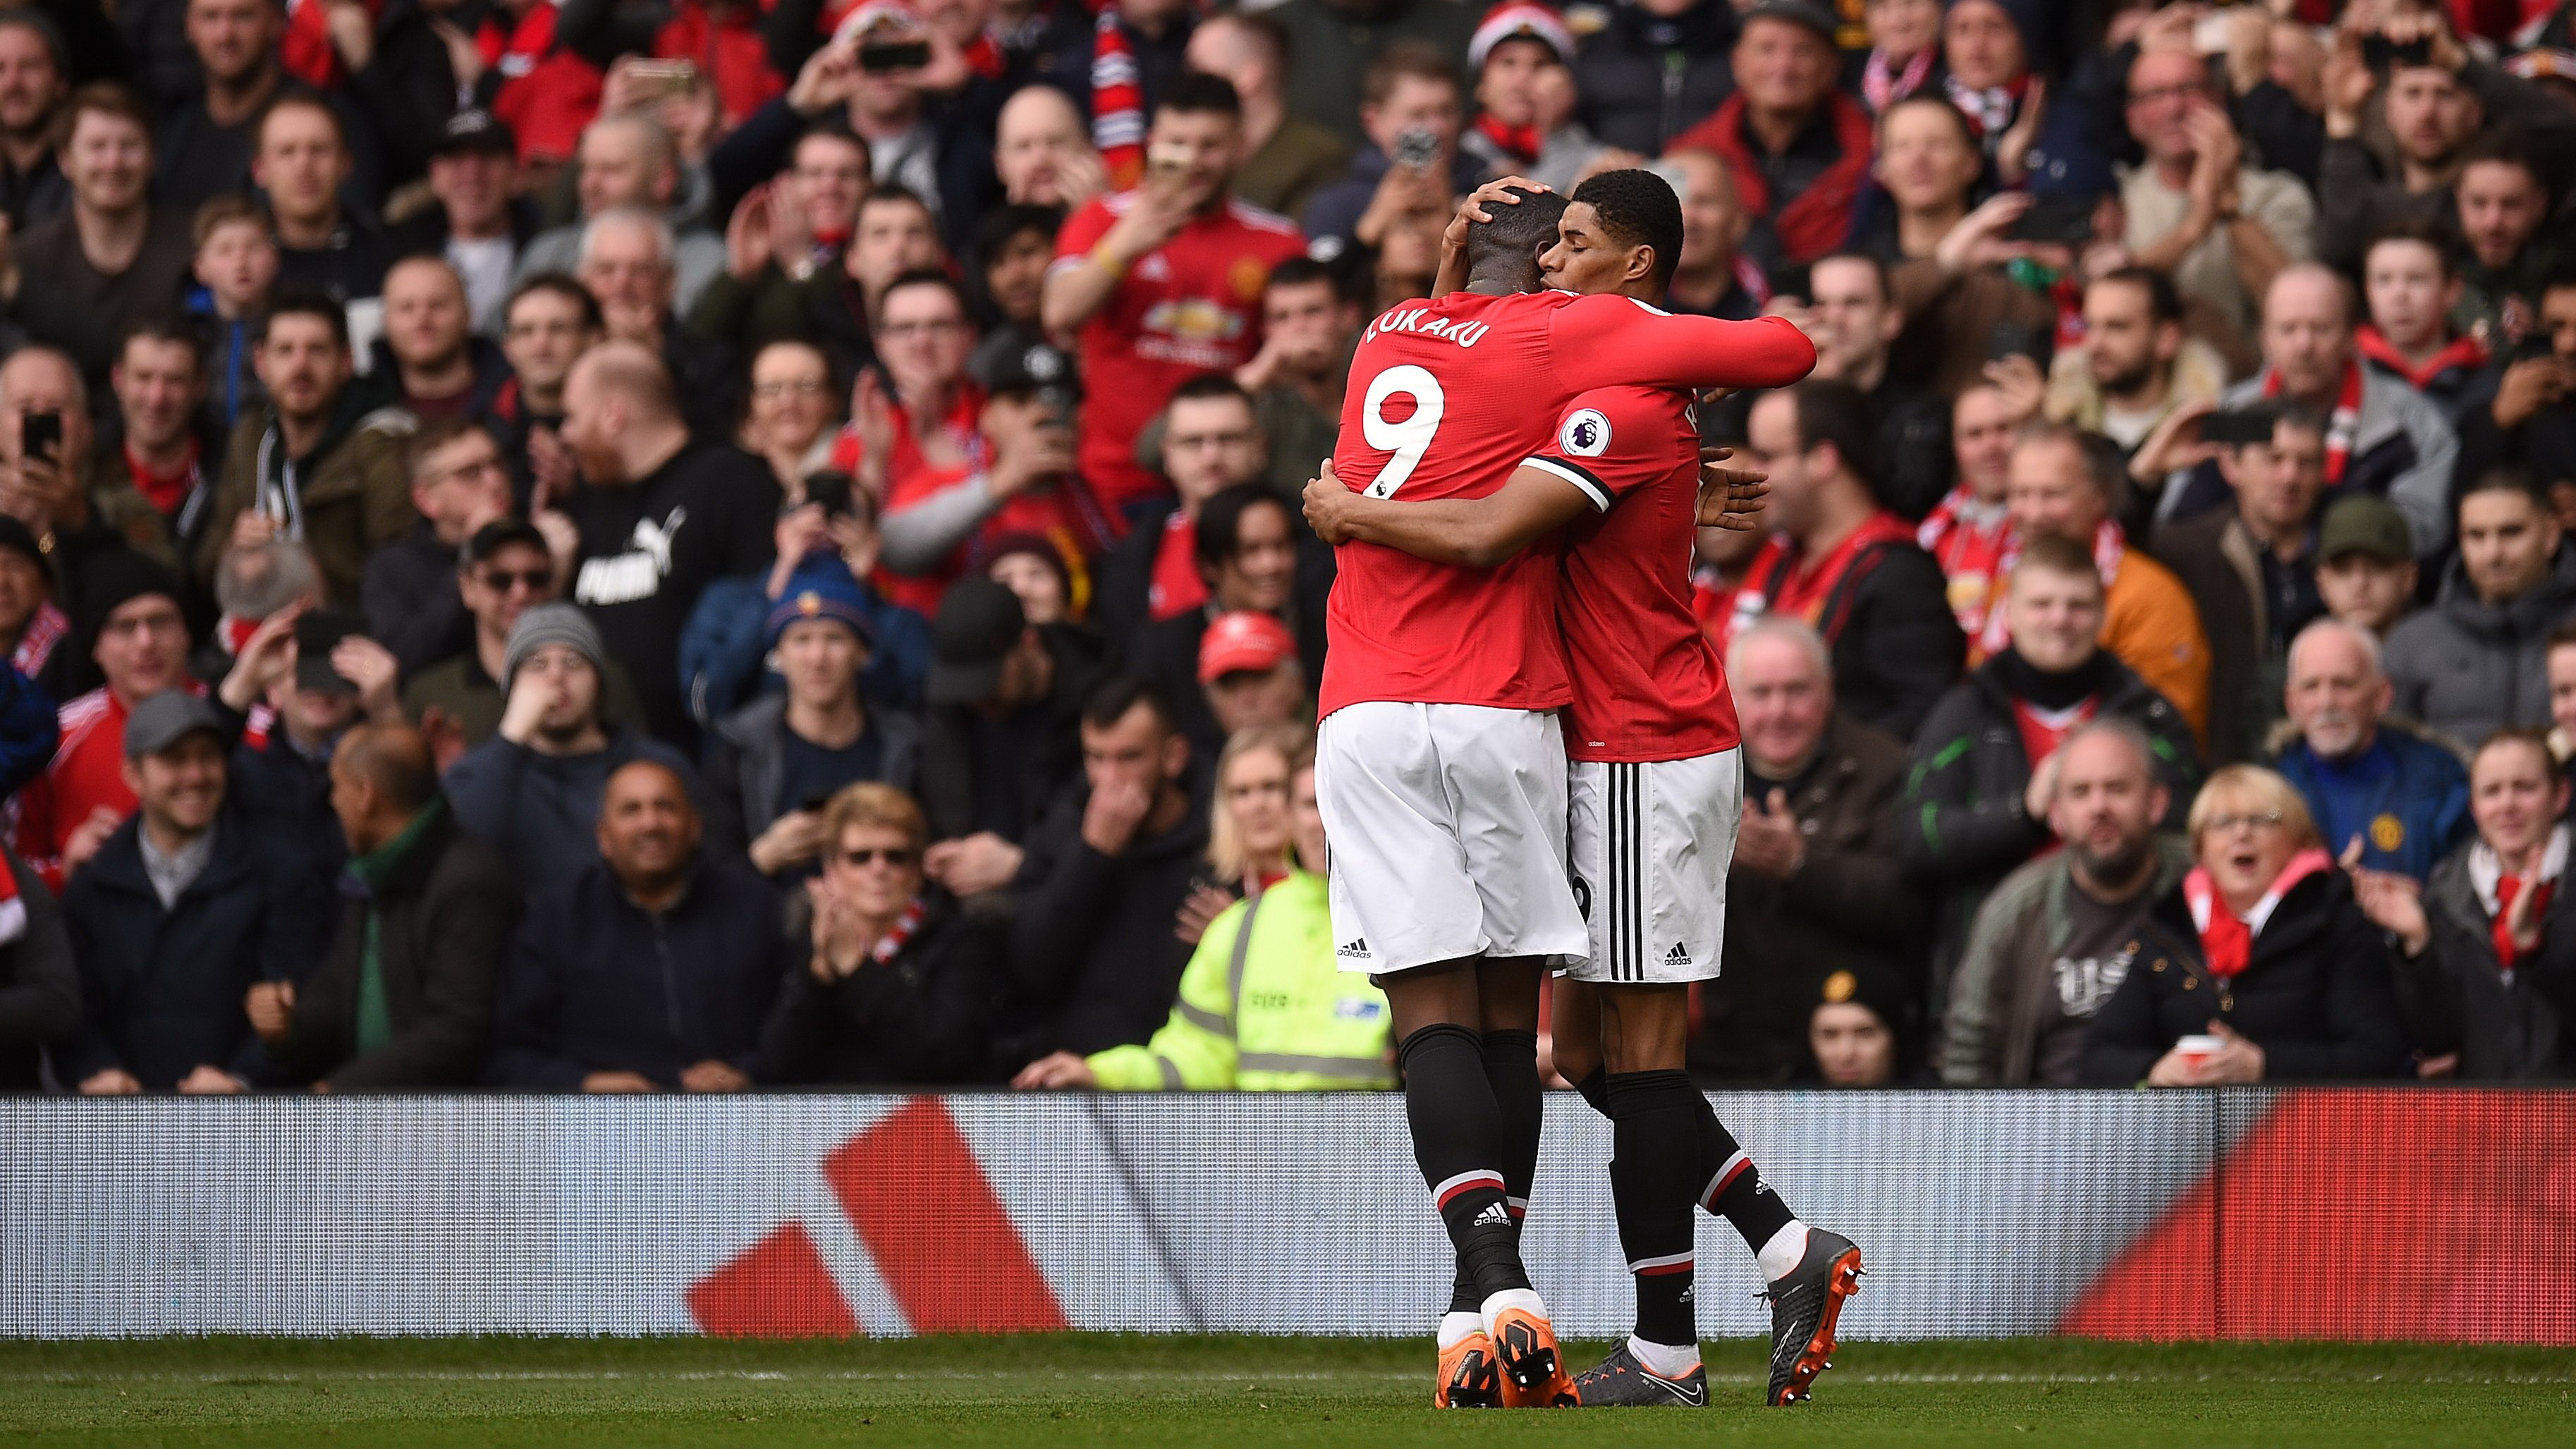 Marcus Rashford Romelu Lukaku Manchester United Liverpool Premier League